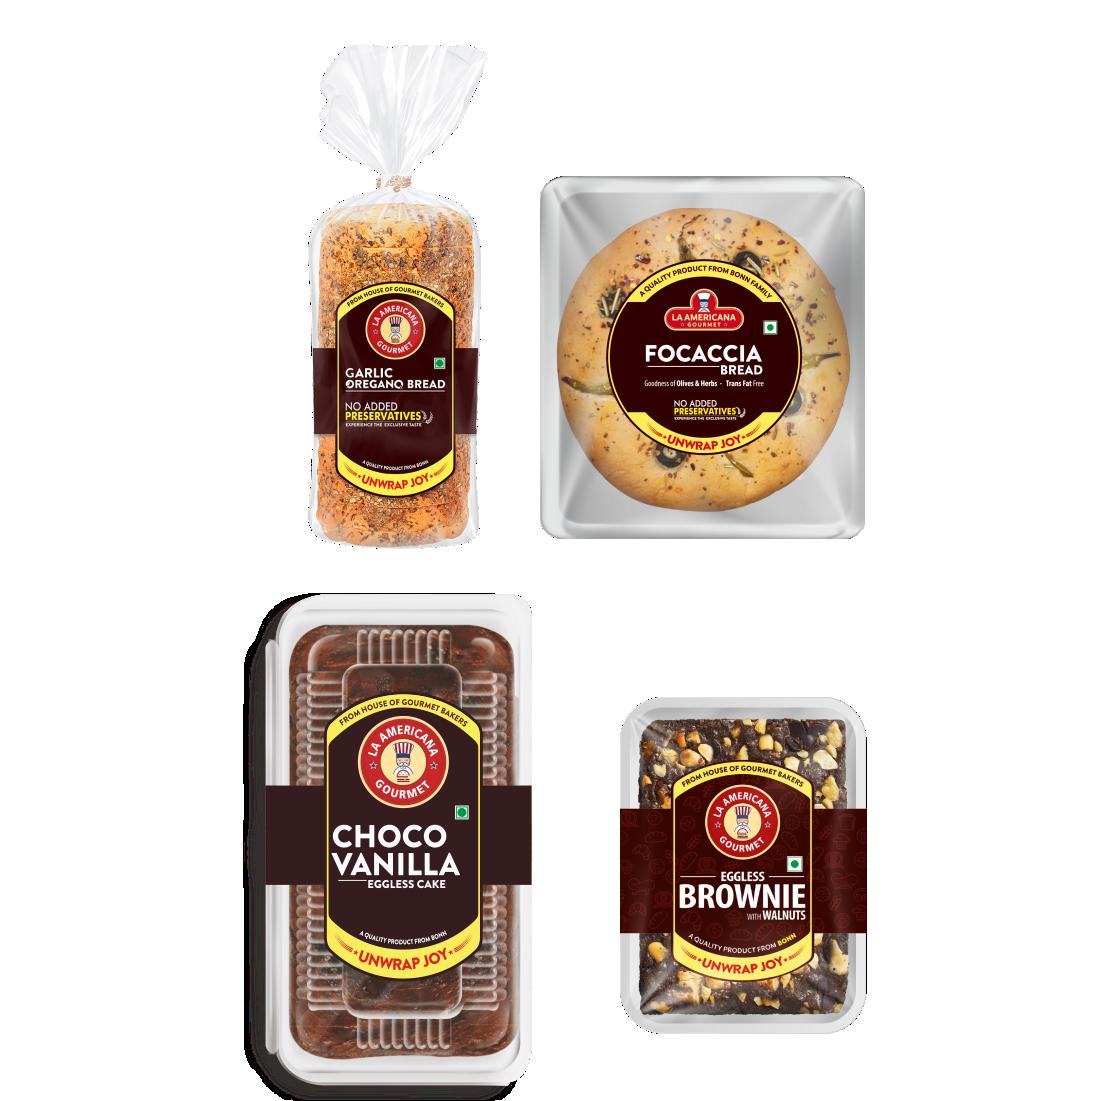 LA Americana Focaccia Bread 100g and Garlic Oregano Bread 250g and Eggless Walnut Brownie 70g and Eggless Choco Vanilla Cake 200g (Pack of 1 each)